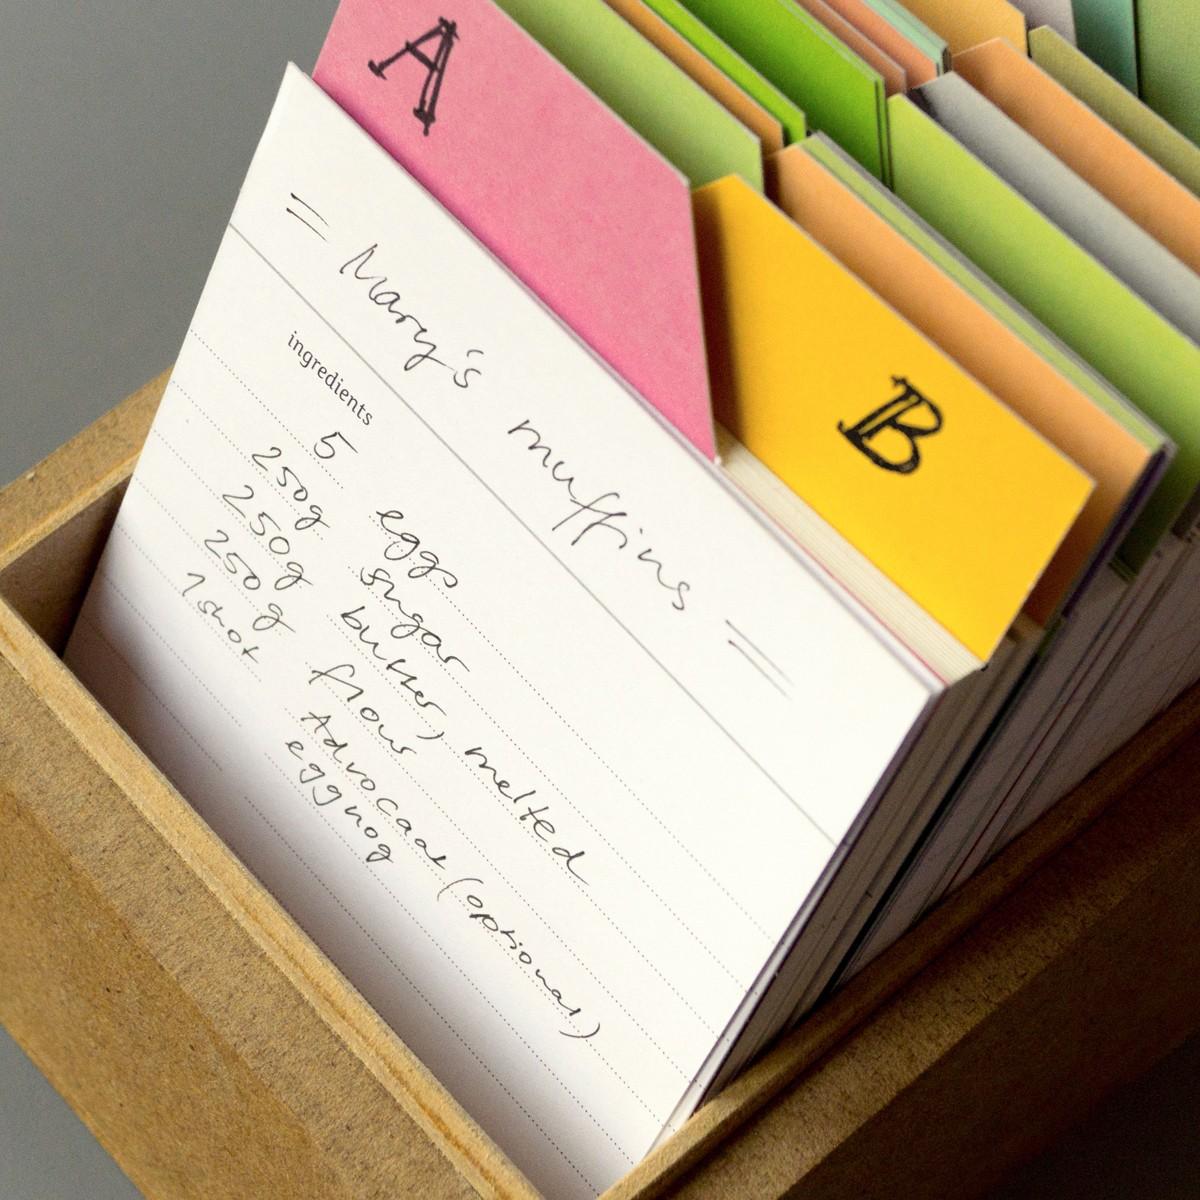 sperlingB – Rezeptbox, mintblau, Karteikartenbox für Rezepte